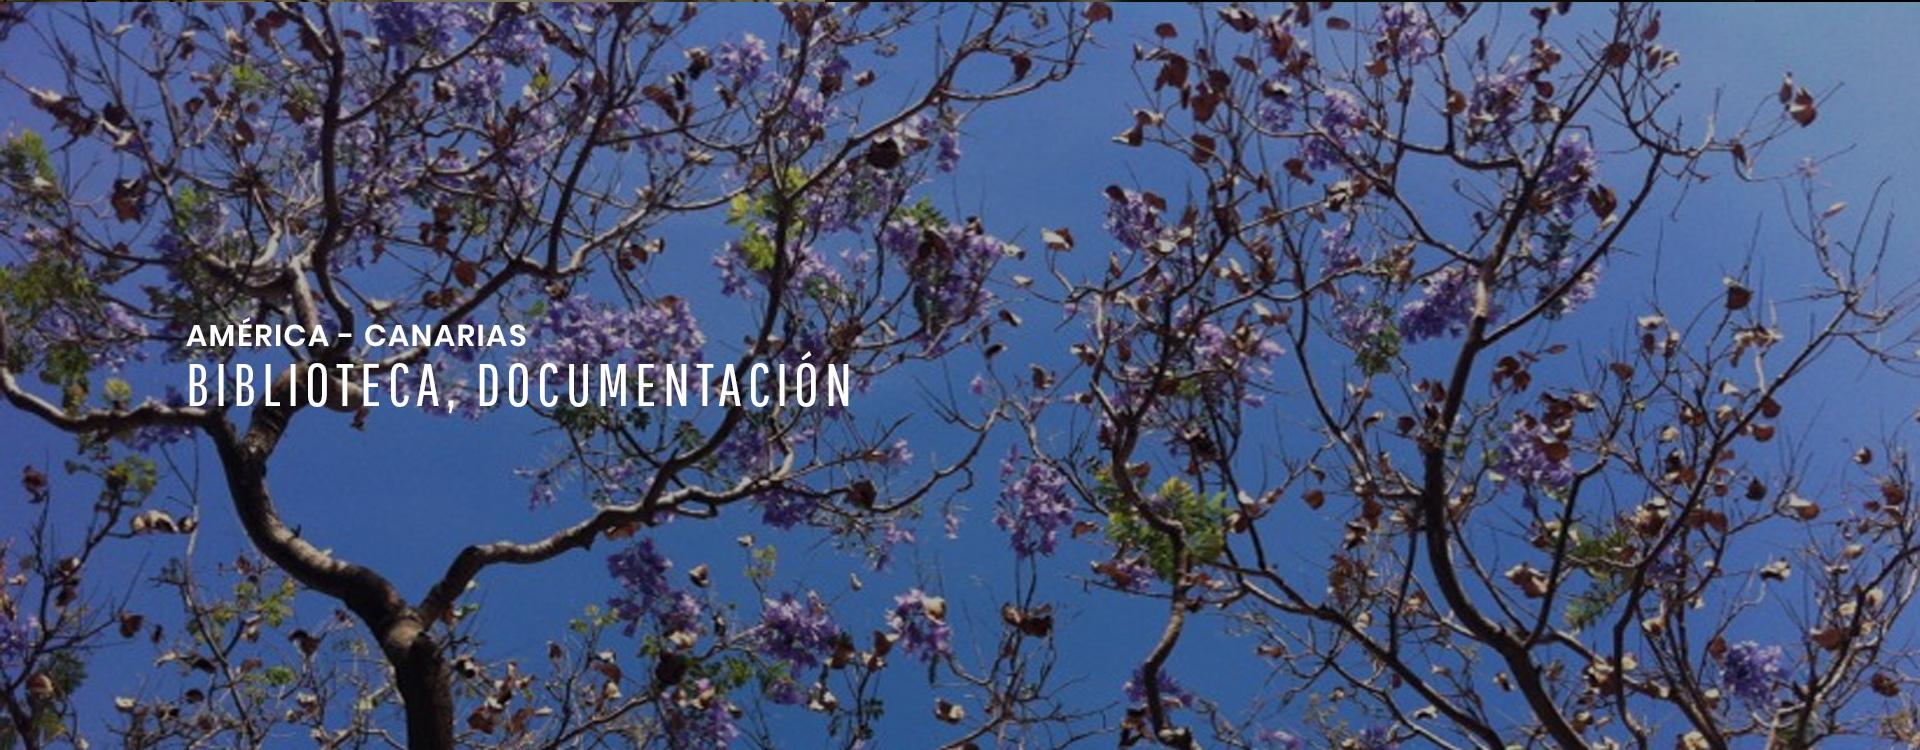 Biblioteca documental de América y Canarias